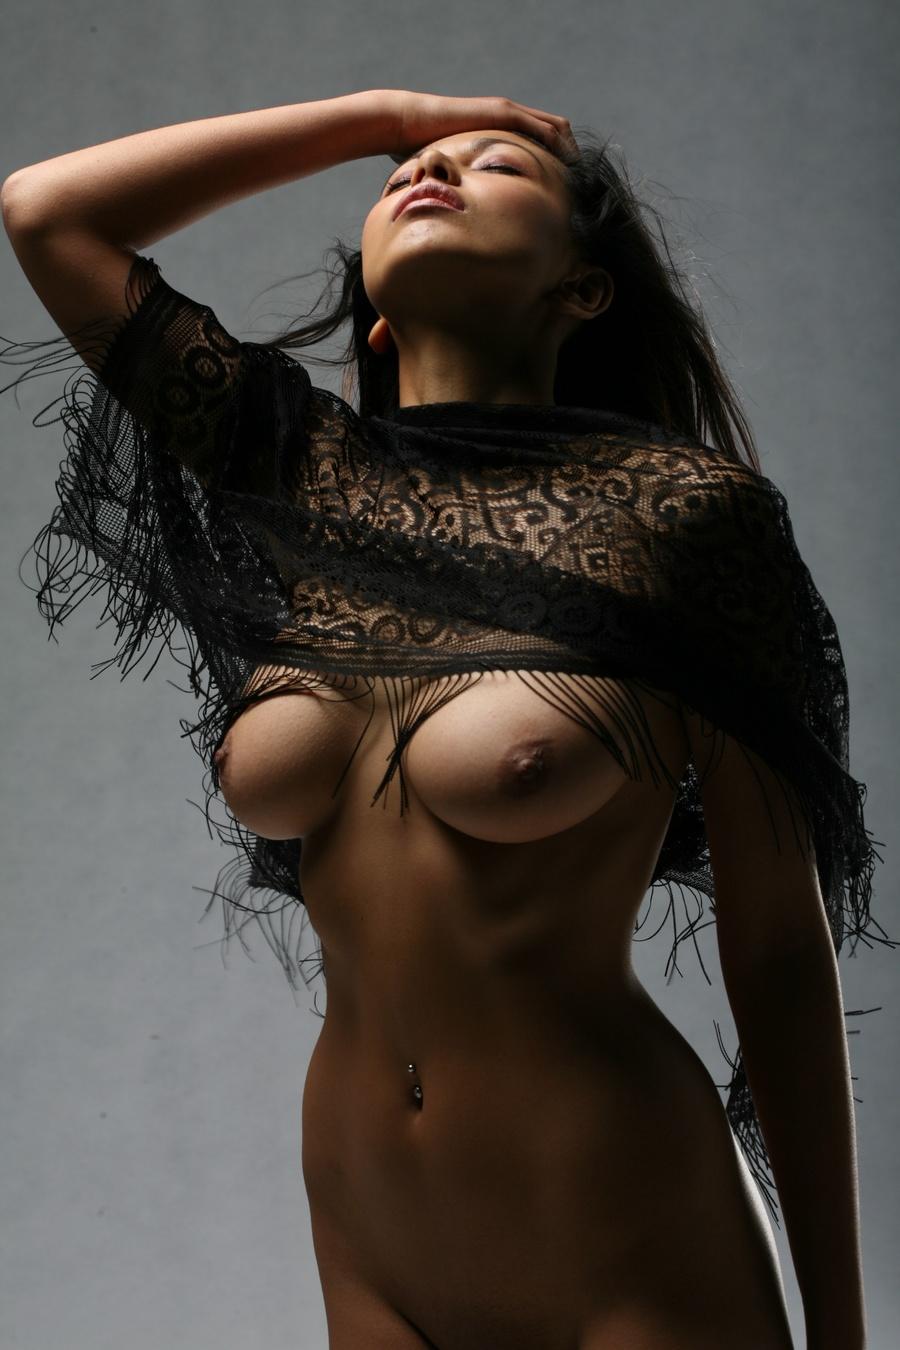 licking-jaipur-college-girl-xxx-image-bisexual